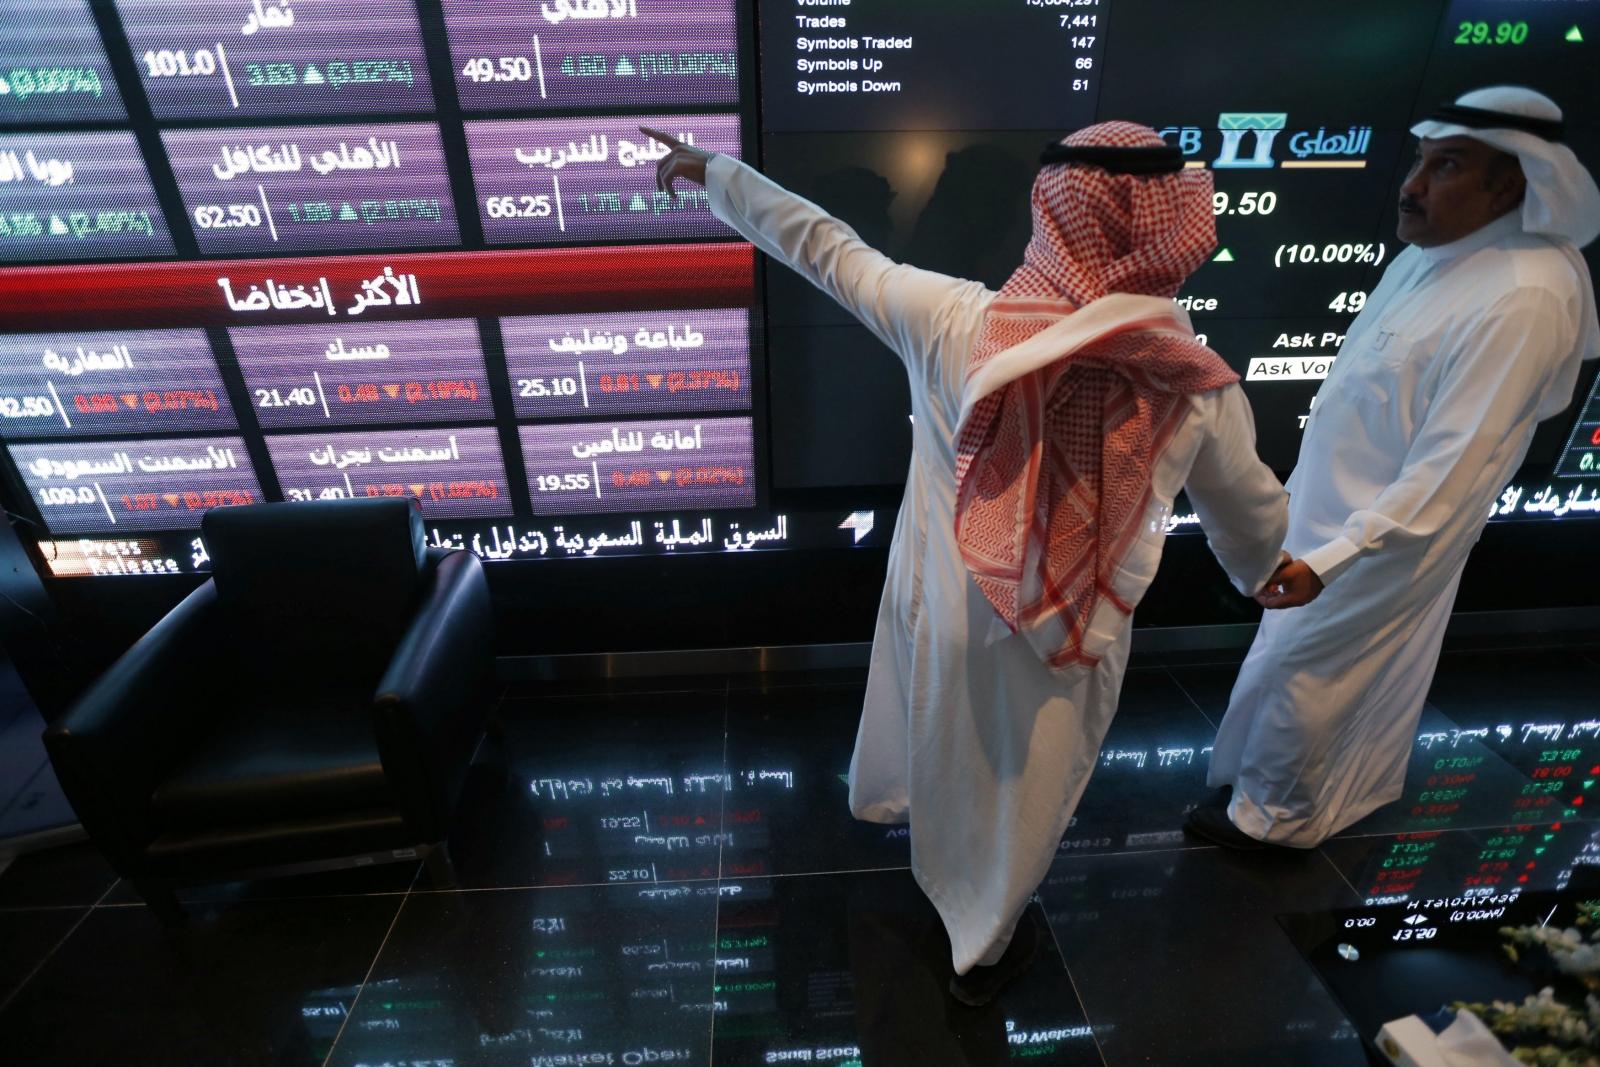 Saudi stock excahnge